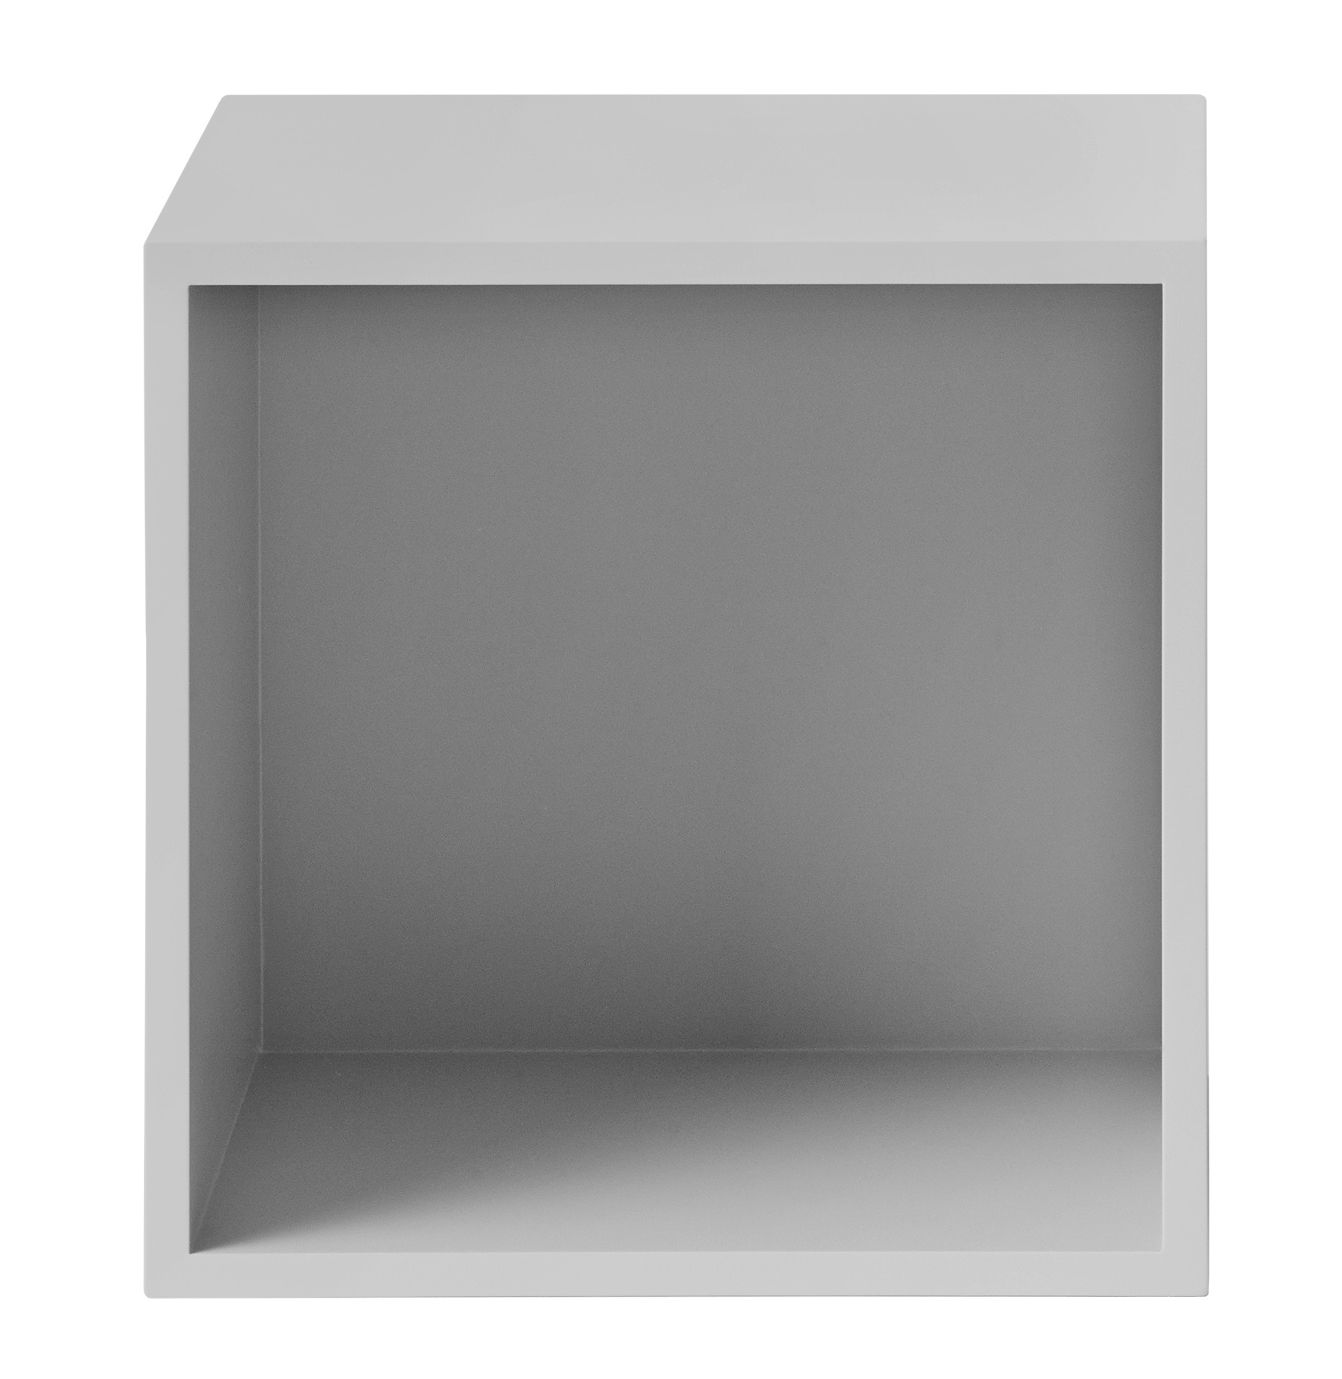 Furniture - Bookcases & Bookshelves - Stacked 2.0 Shelf - / Medium carré 43x43 cm / Avec fond by Muuto - Light grey - Painted MDF